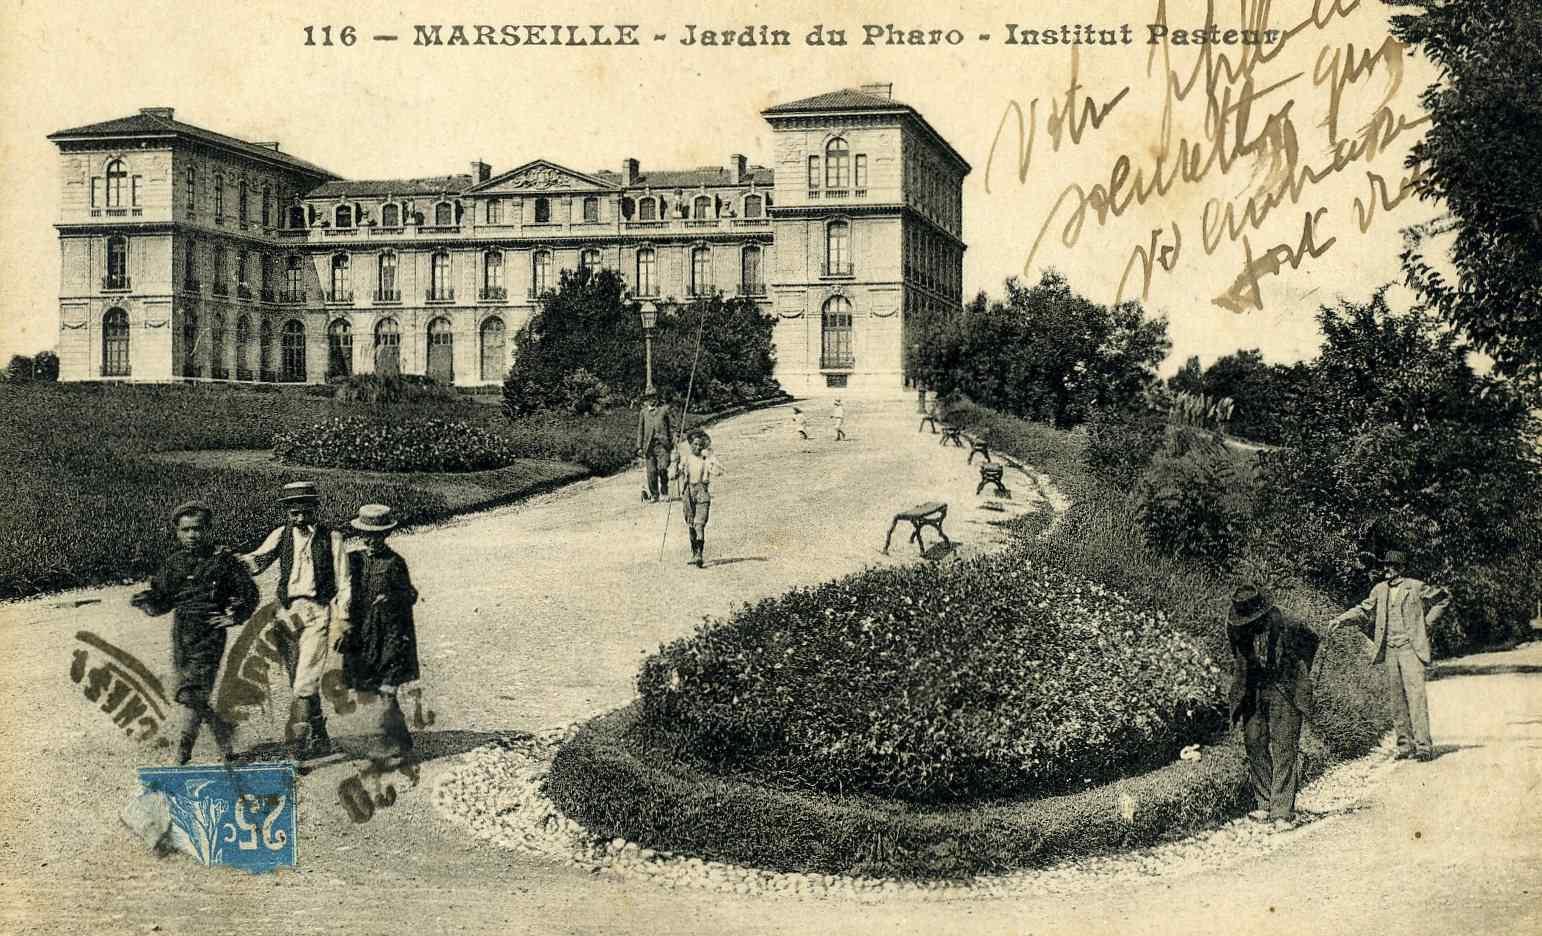 Cartes postales anciennes region paca page 4 for Jardin anglais marseille